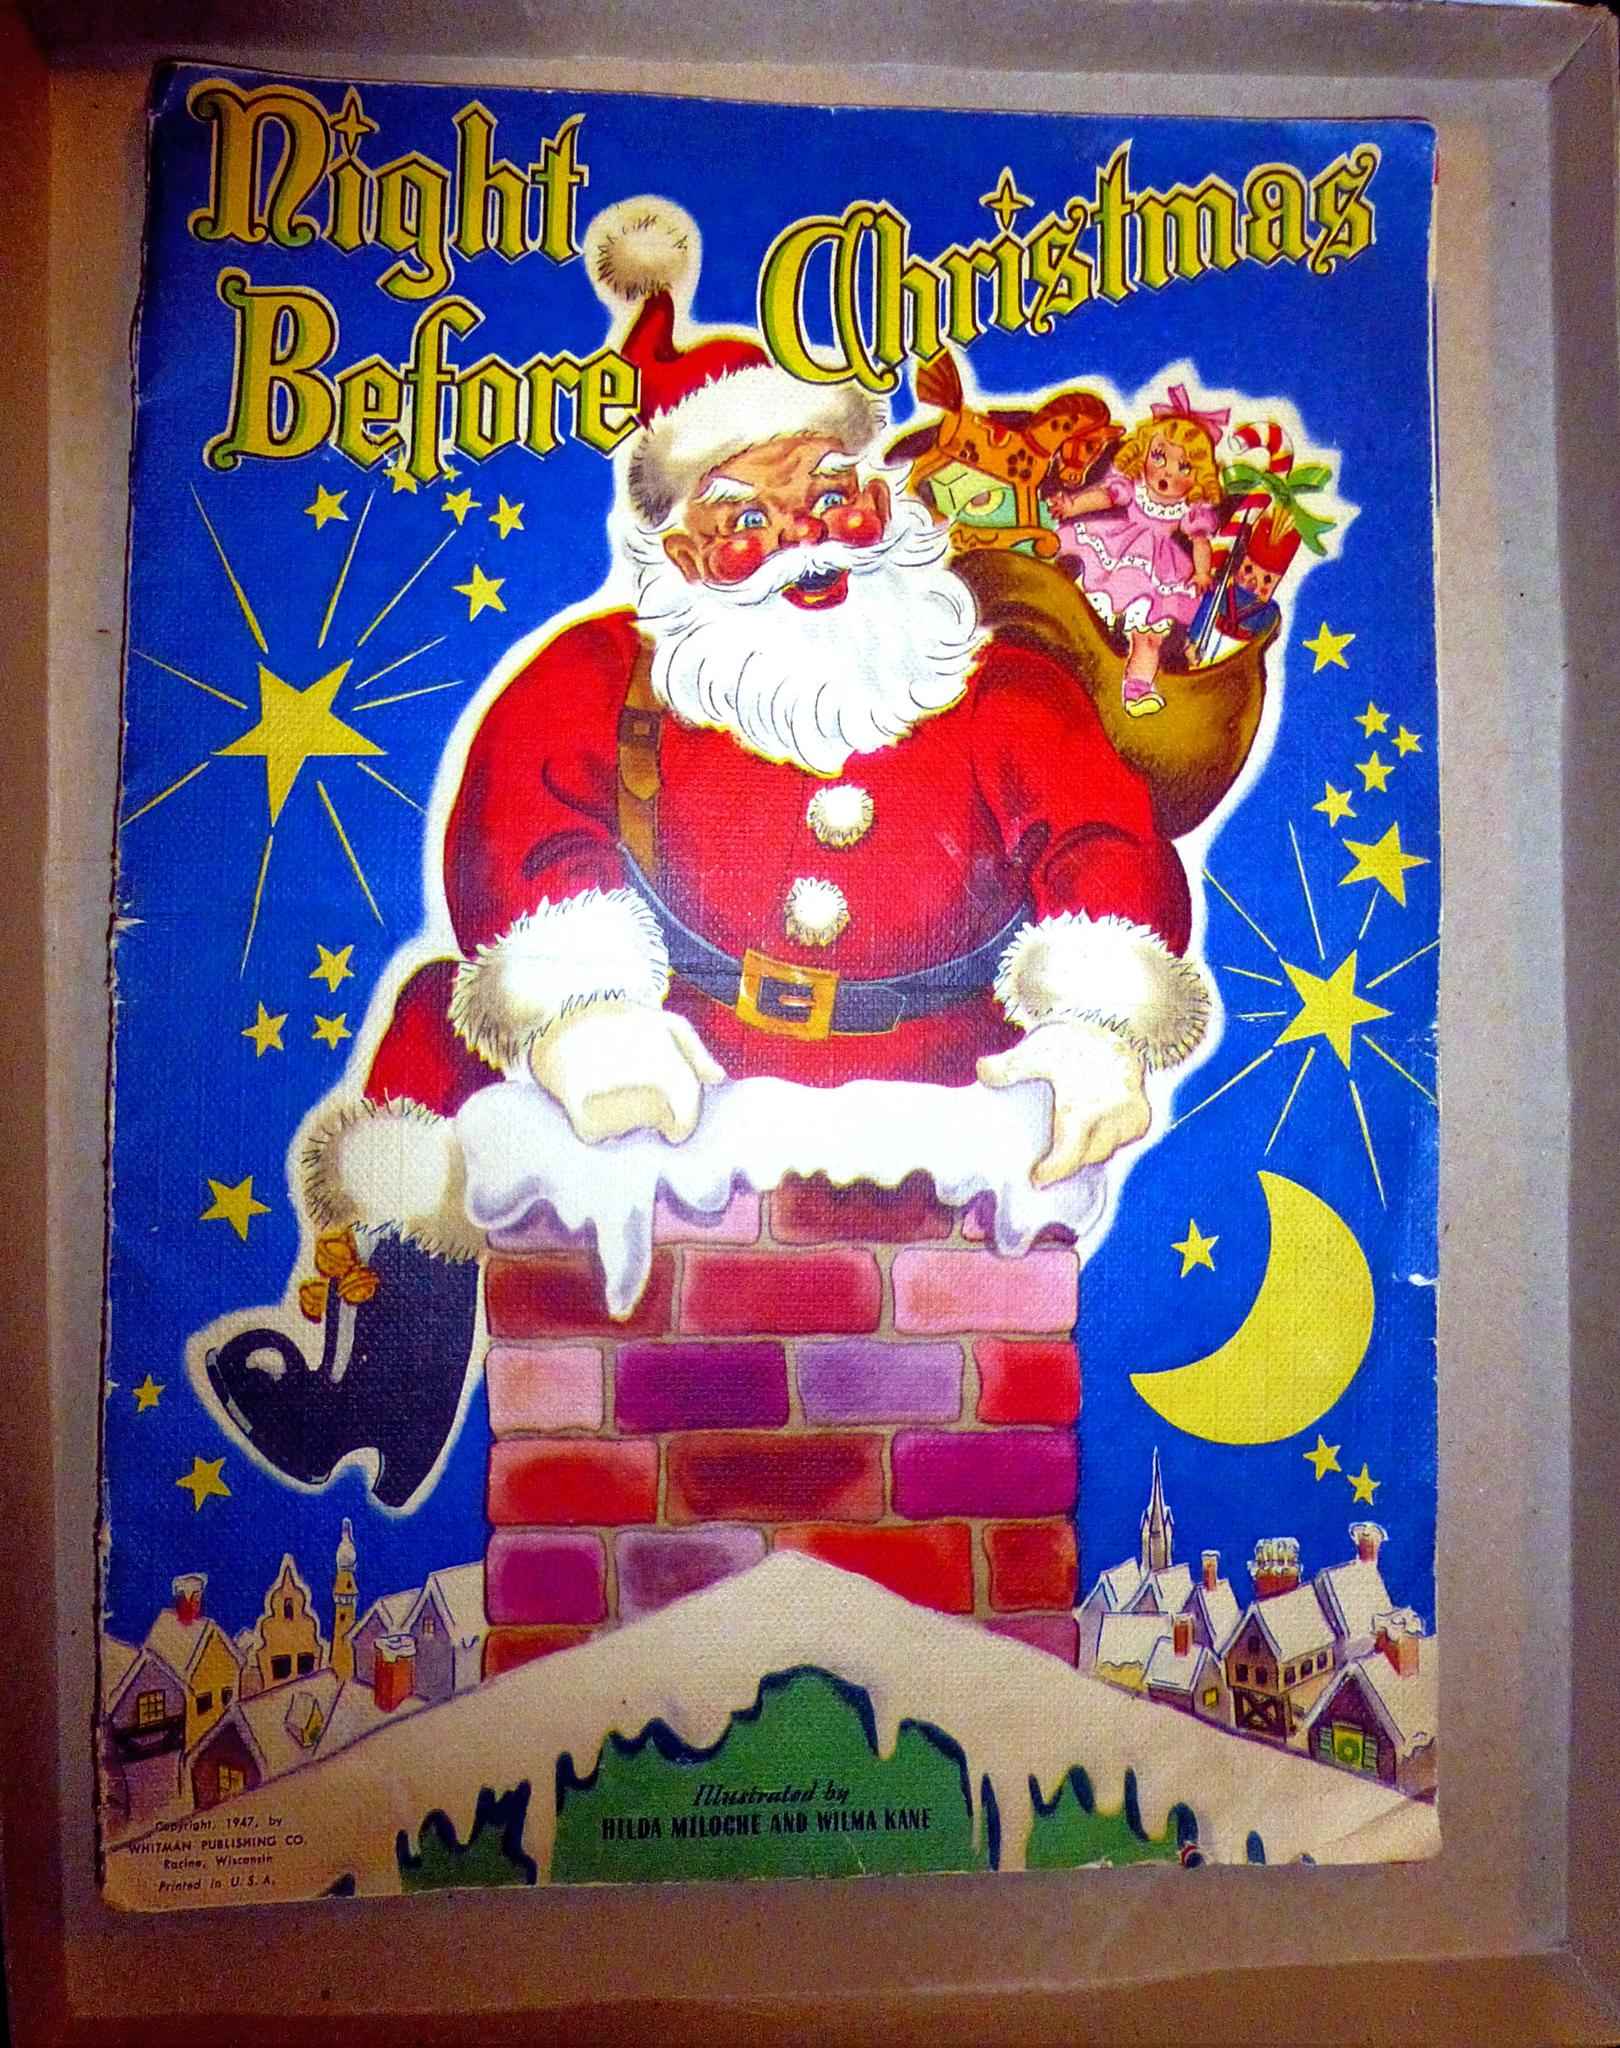 Night Before Christmas by Terri Scache Harris